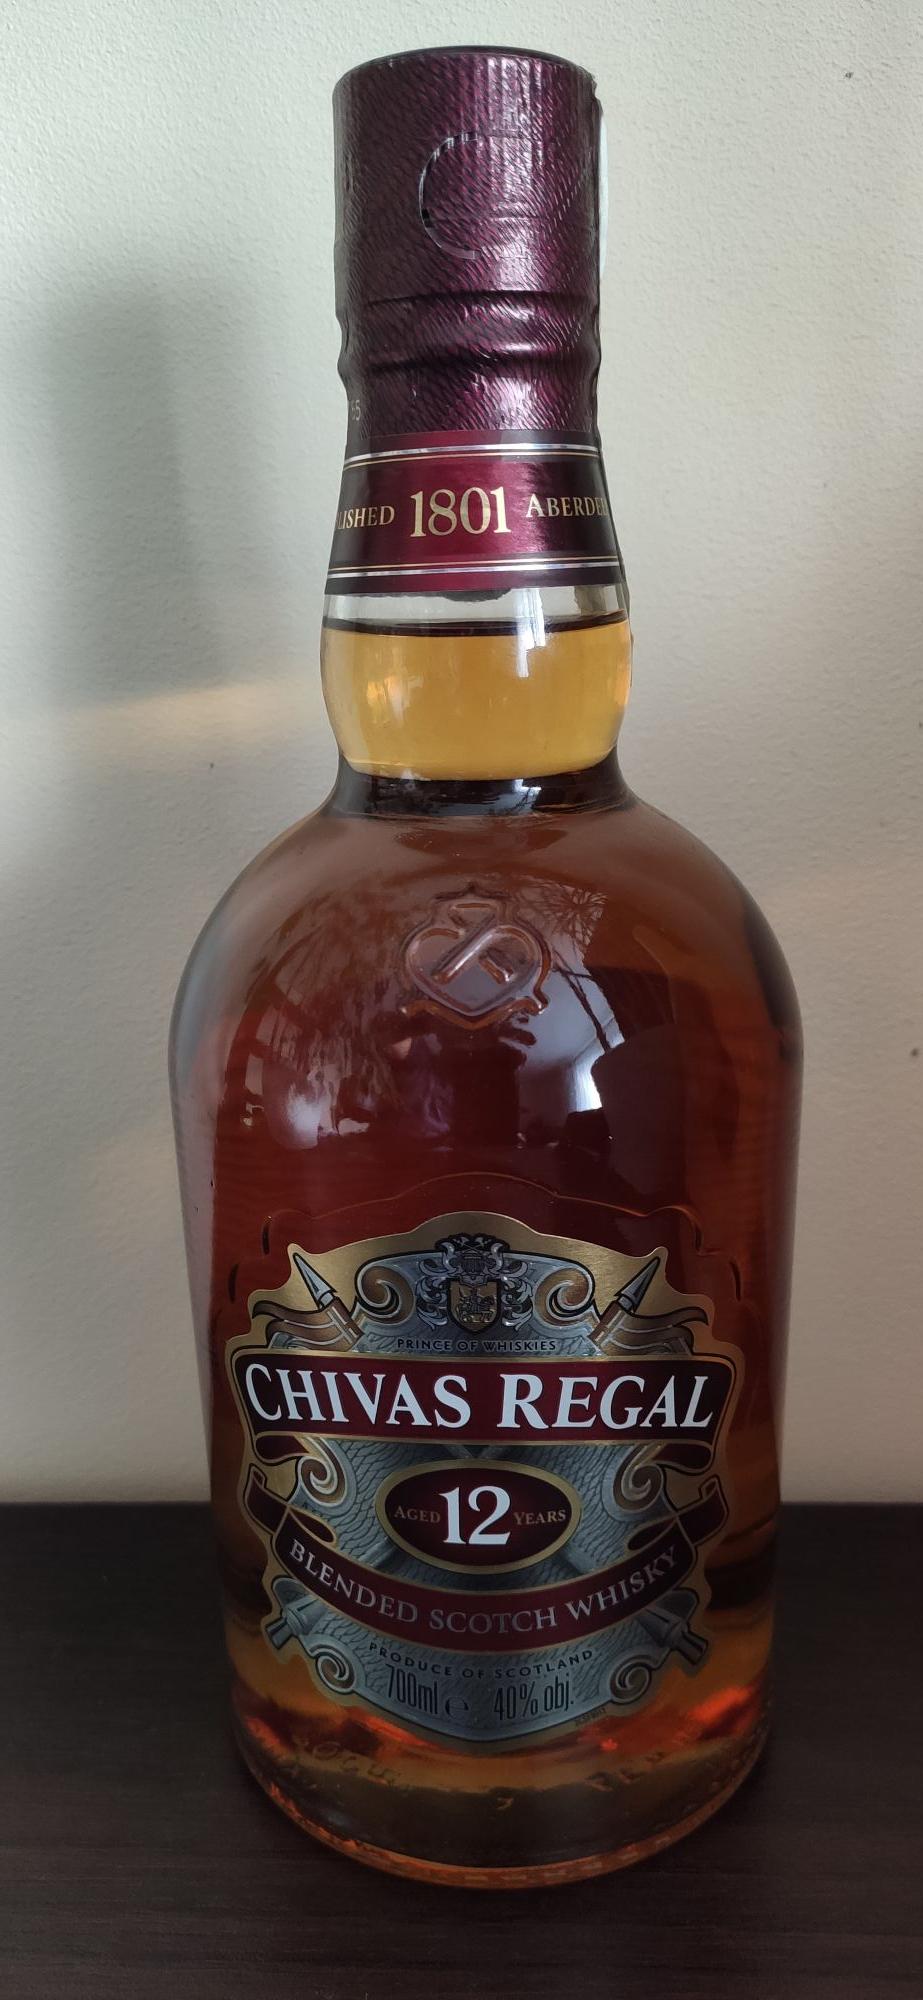 Chivas Regal 0,7l Scotch Whisky Netto